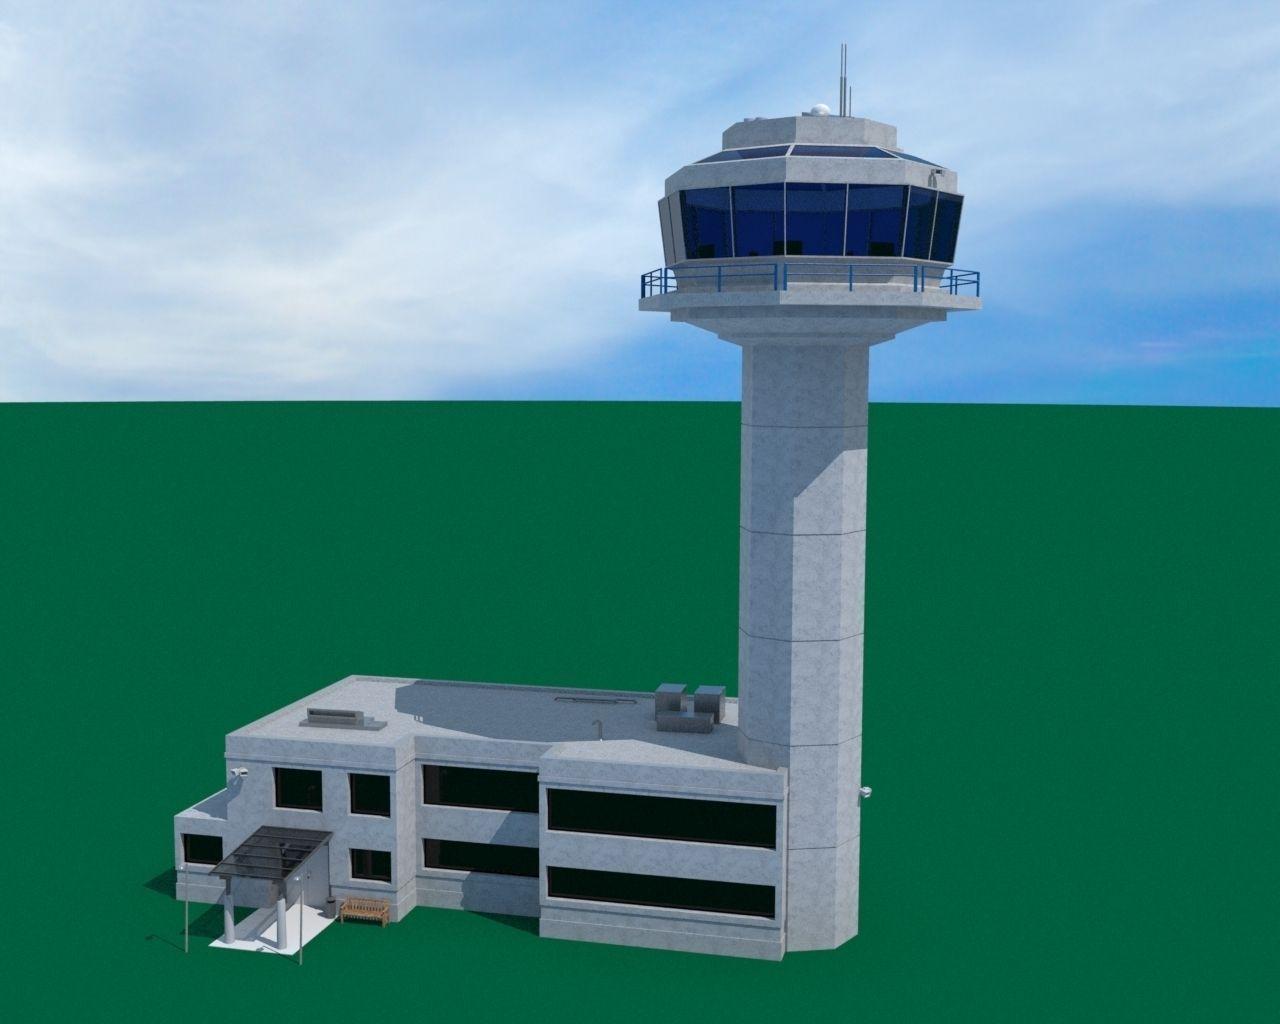 Air Traffic Control Tower 3d Model Obj Fbx Lwo Lw Lws